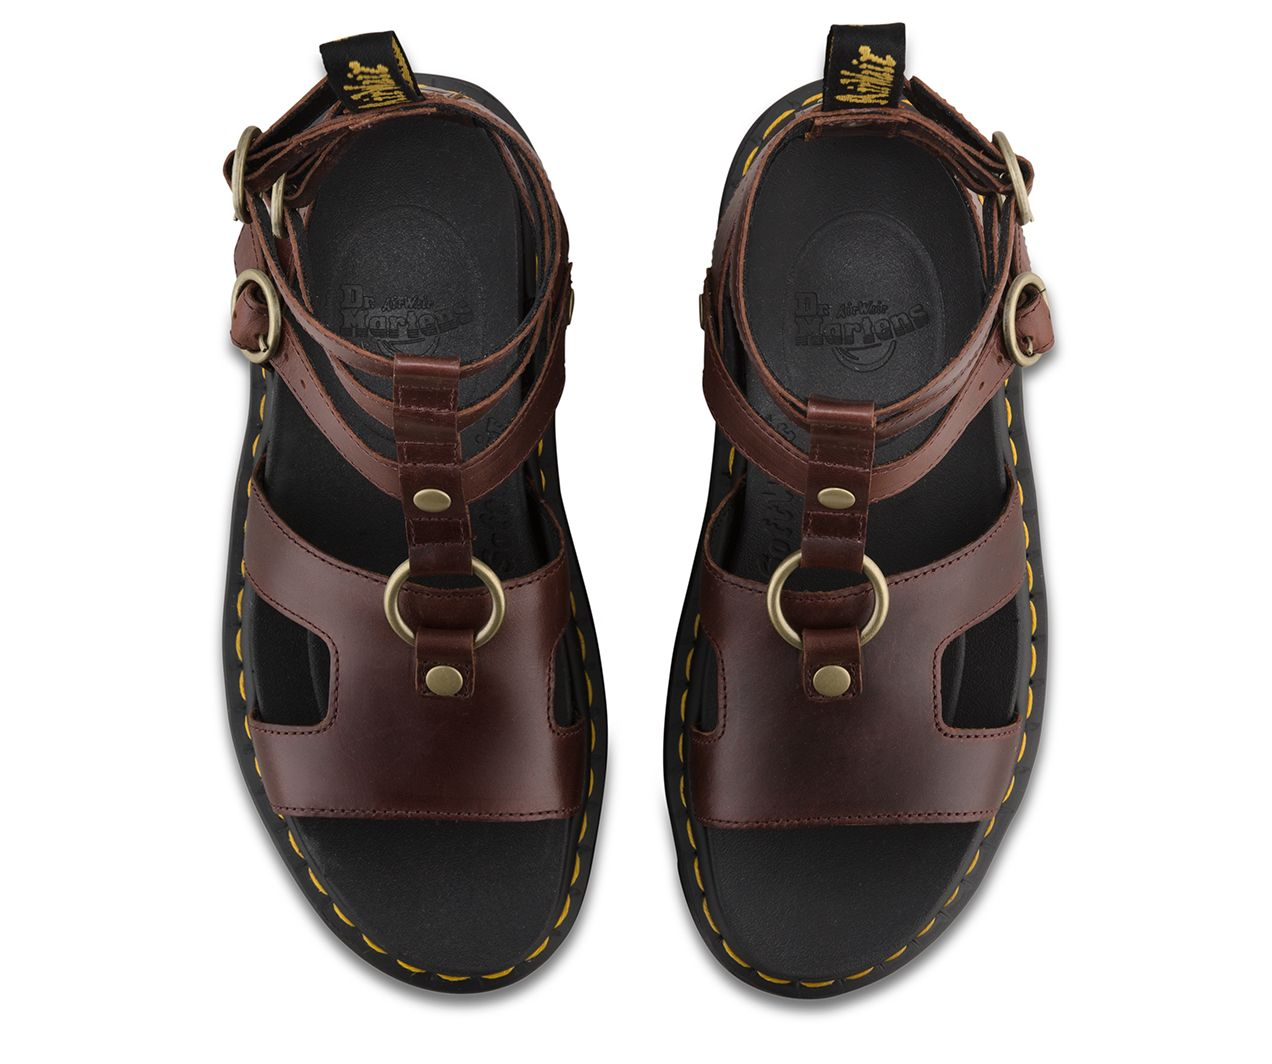 ca1882c8943 Dr martens adaira brando in 2019 | Sandals | Dr martens sandals ...